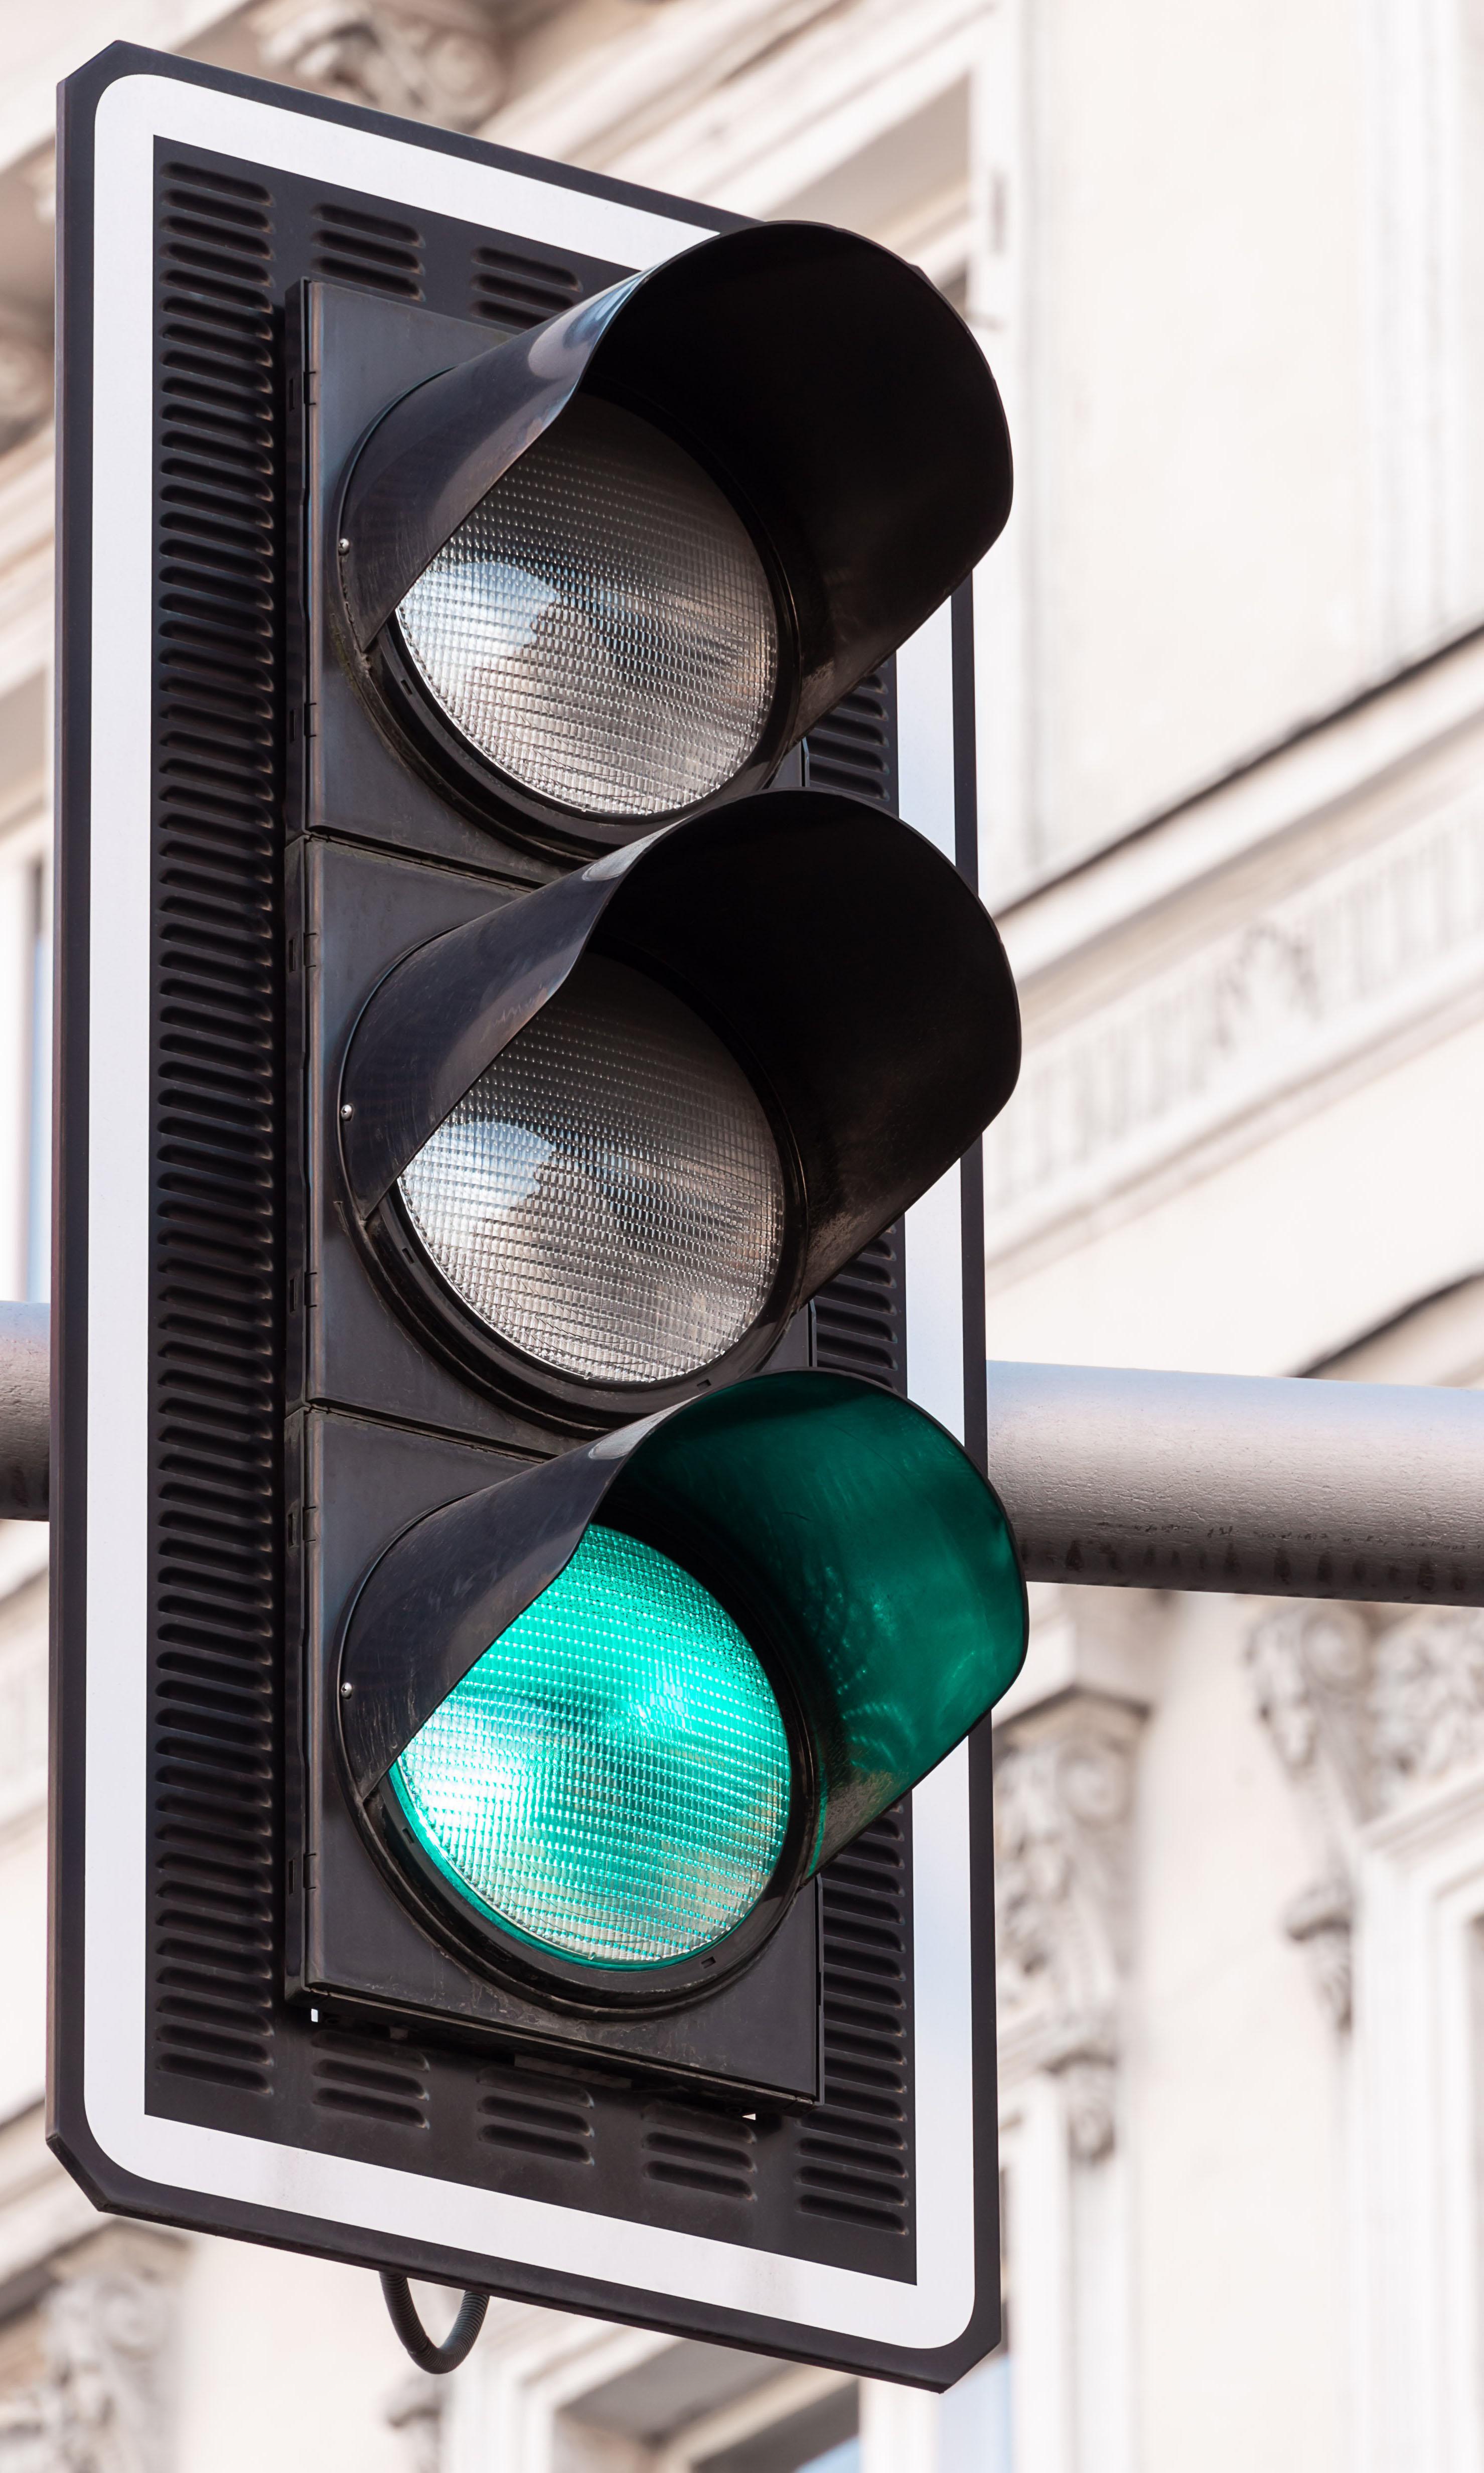 Big Changes on Horizon for Traffic Impact Analysis Under CEQA